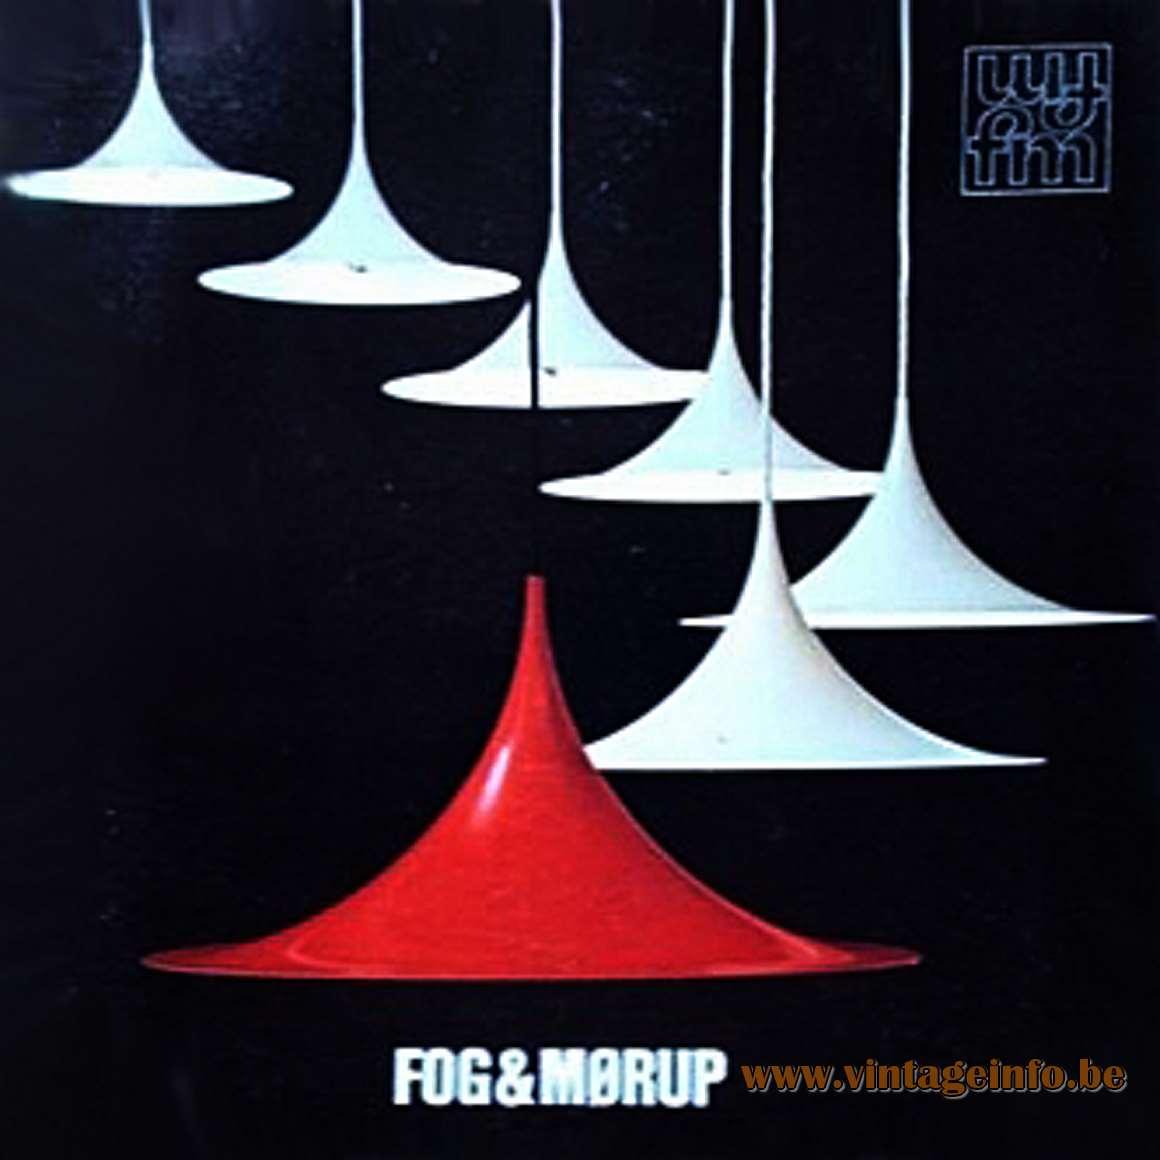 Fog & Mørup Semi Pendant Lamp - Catalogue Picture - 1967 Design: Torsten Thorup & Claus Bonderup, Denmark